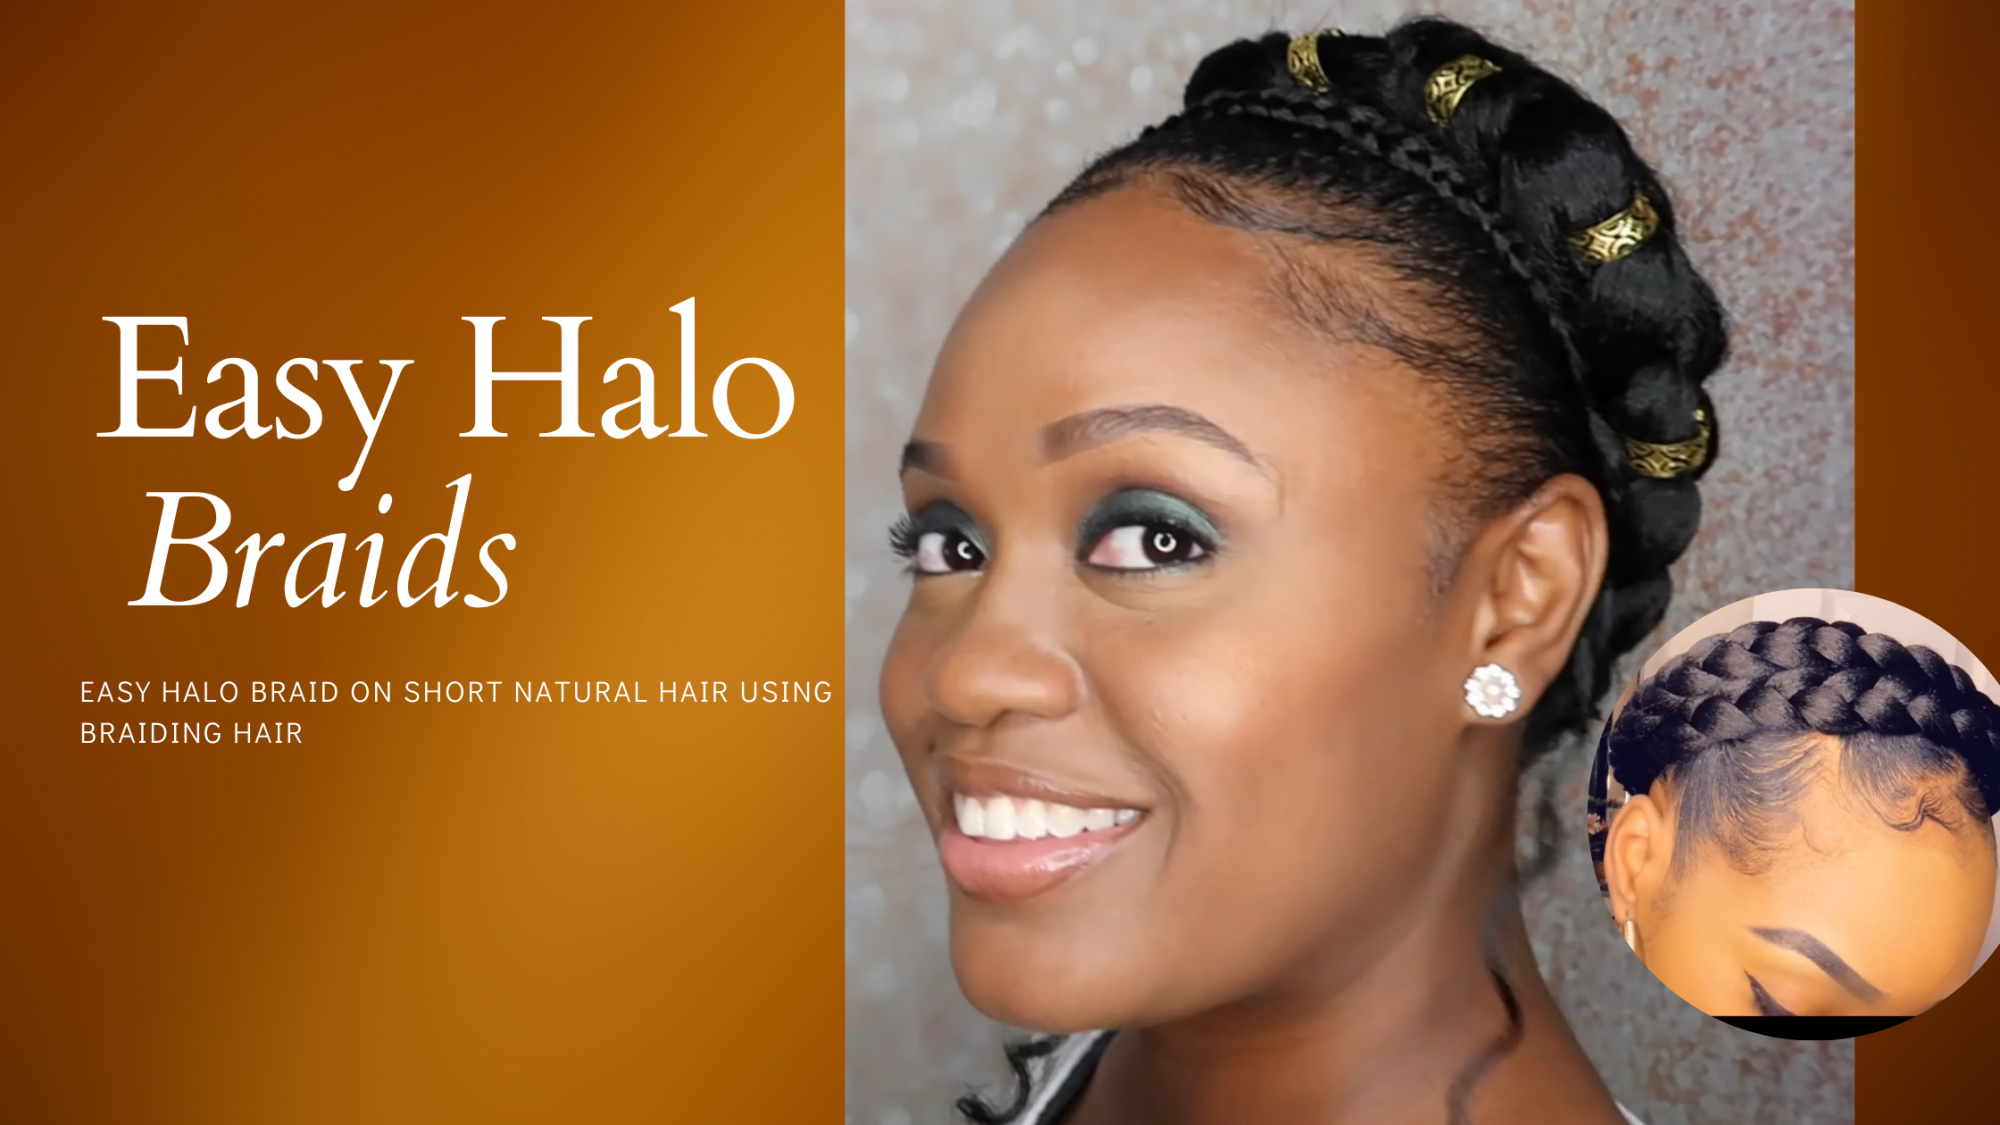 EASY HALO BRAID ON SHORT HAIR